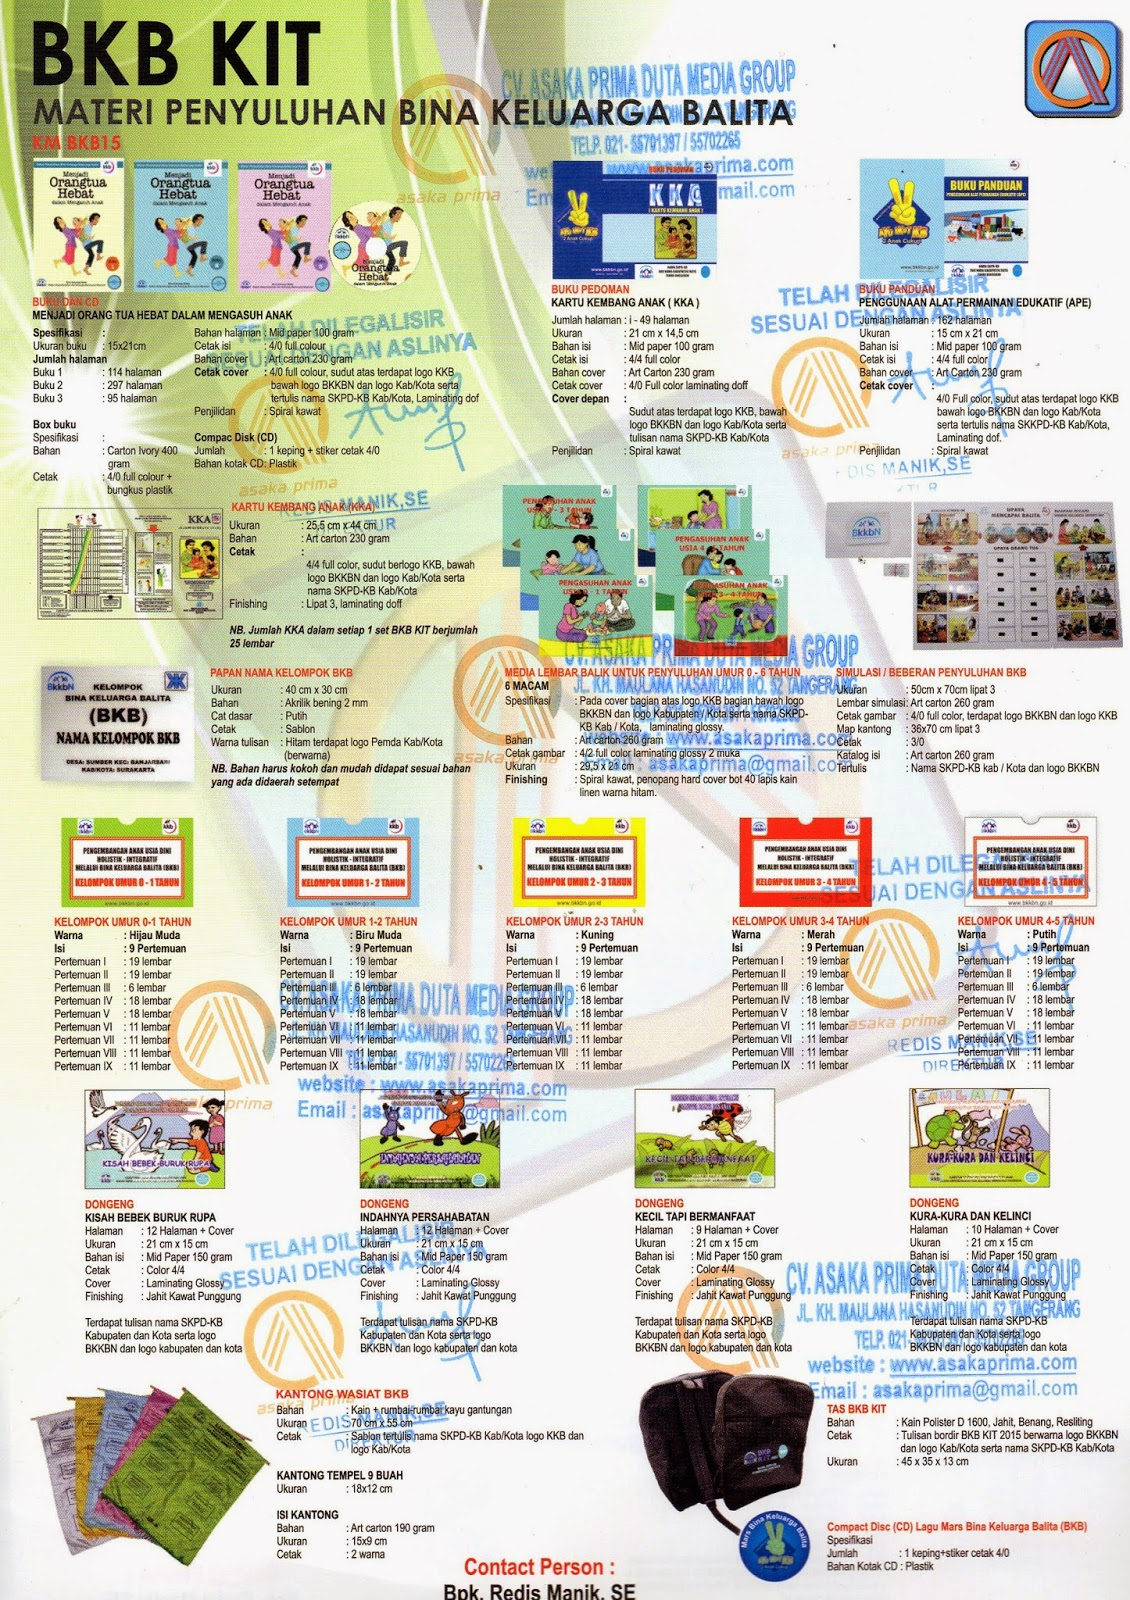 bkb kit  2015, bkbkit 2015,bkb-kit,jual bkb kit,BKB-Kit alat peraga edukatif